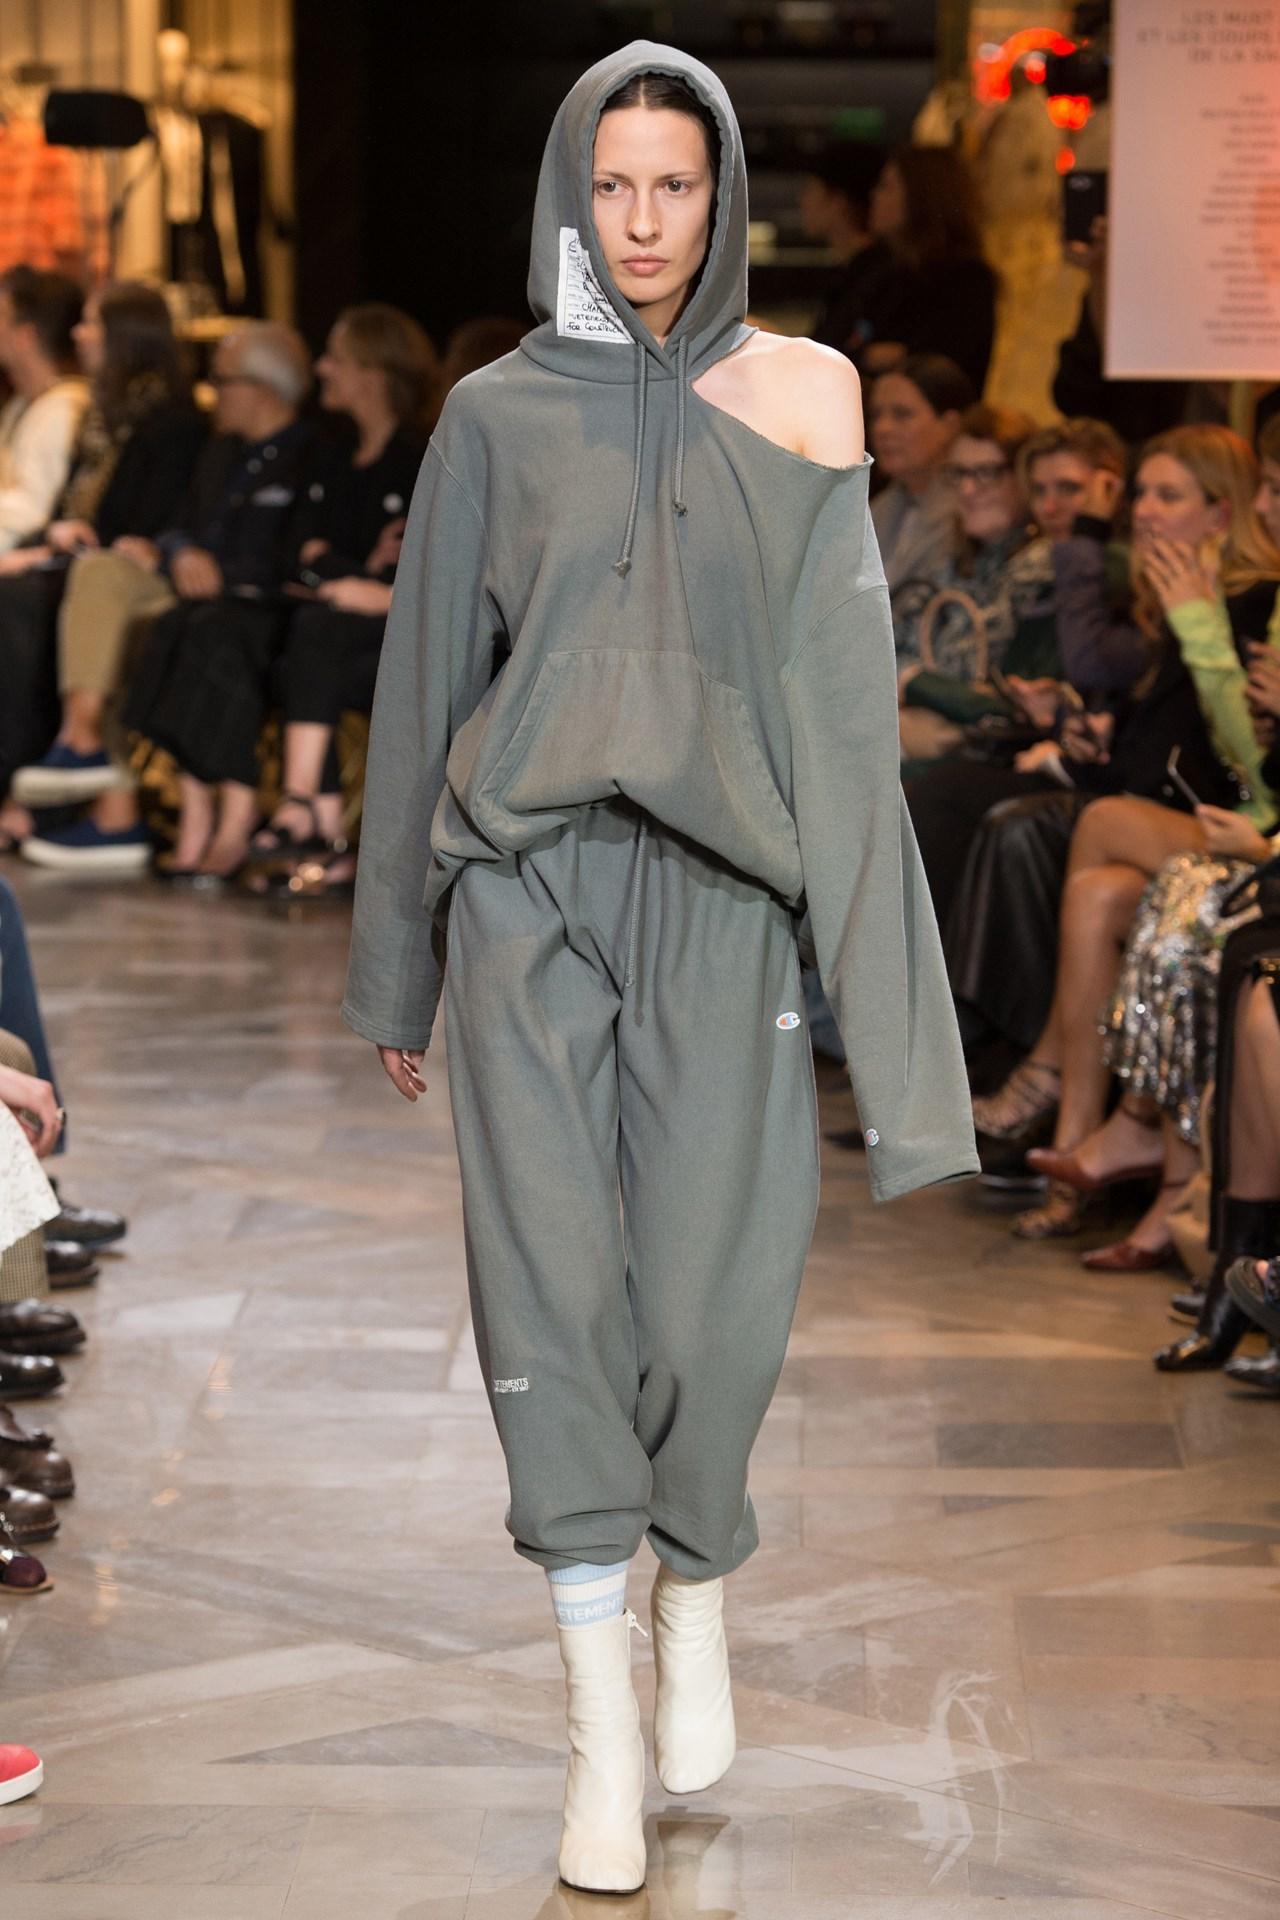 shop 'til you drop: vetements brings consumerism to couture - i-D